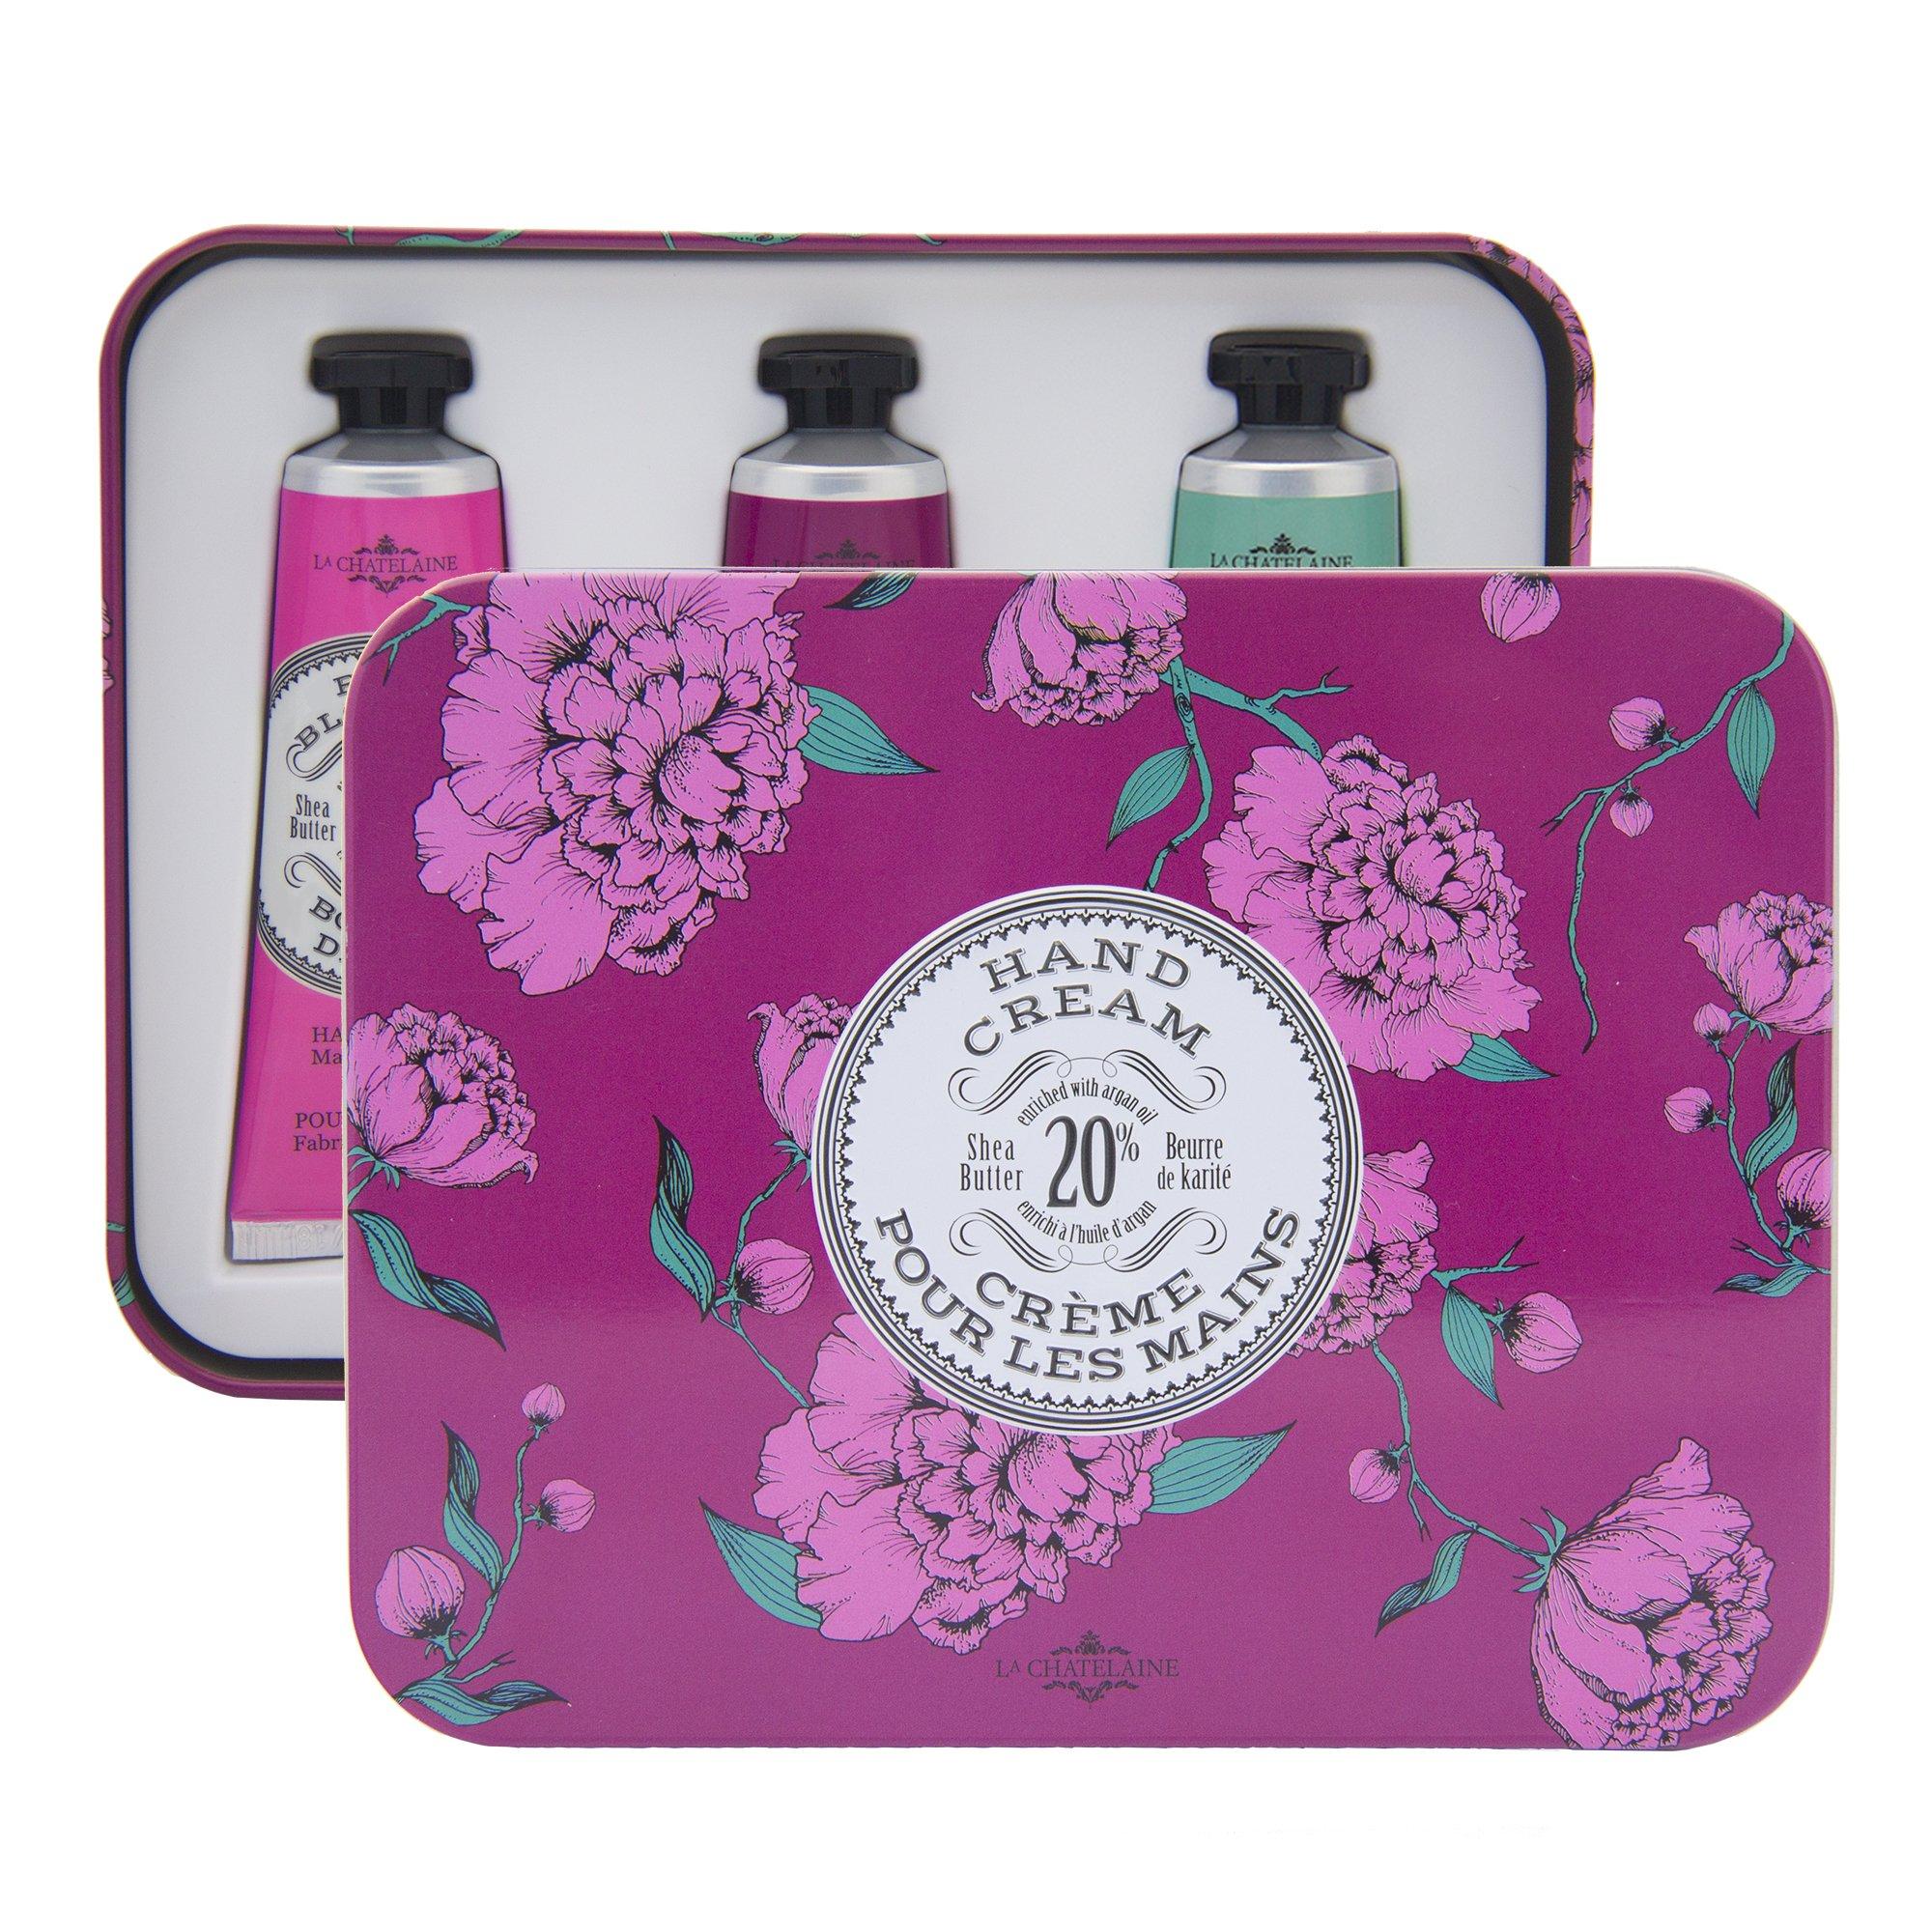 La Chatelaine 20% Shea Butter Hand Cream Eggplant Tin Gift Set, Cherry Almond, Wild Fig, Winter Flower